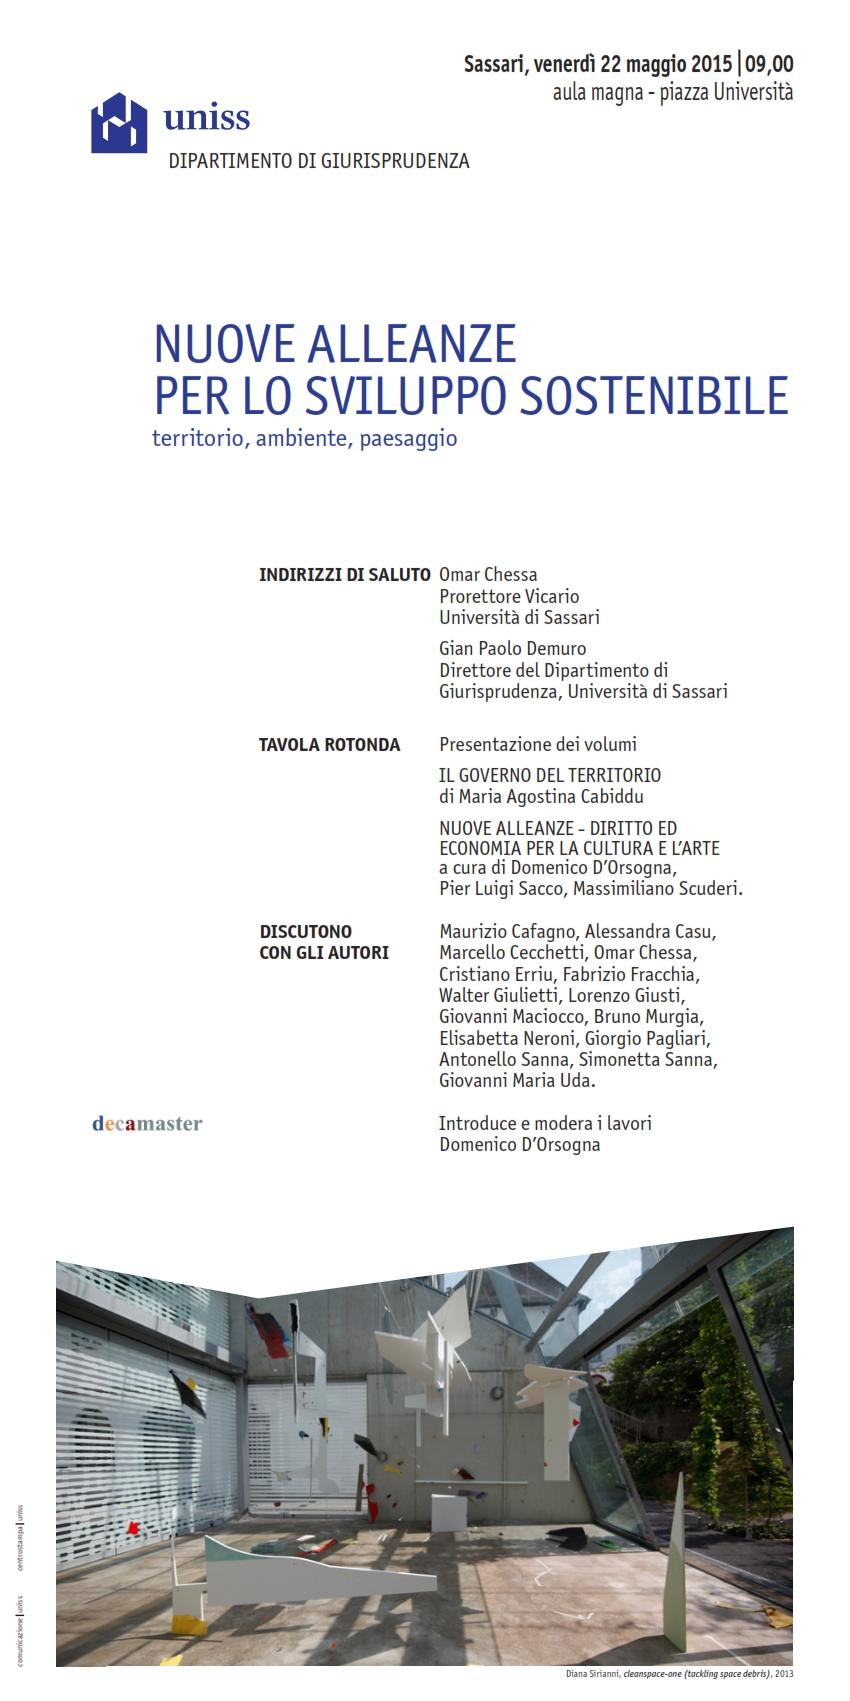 Convegno Nuove Alleanze Sassari 2015